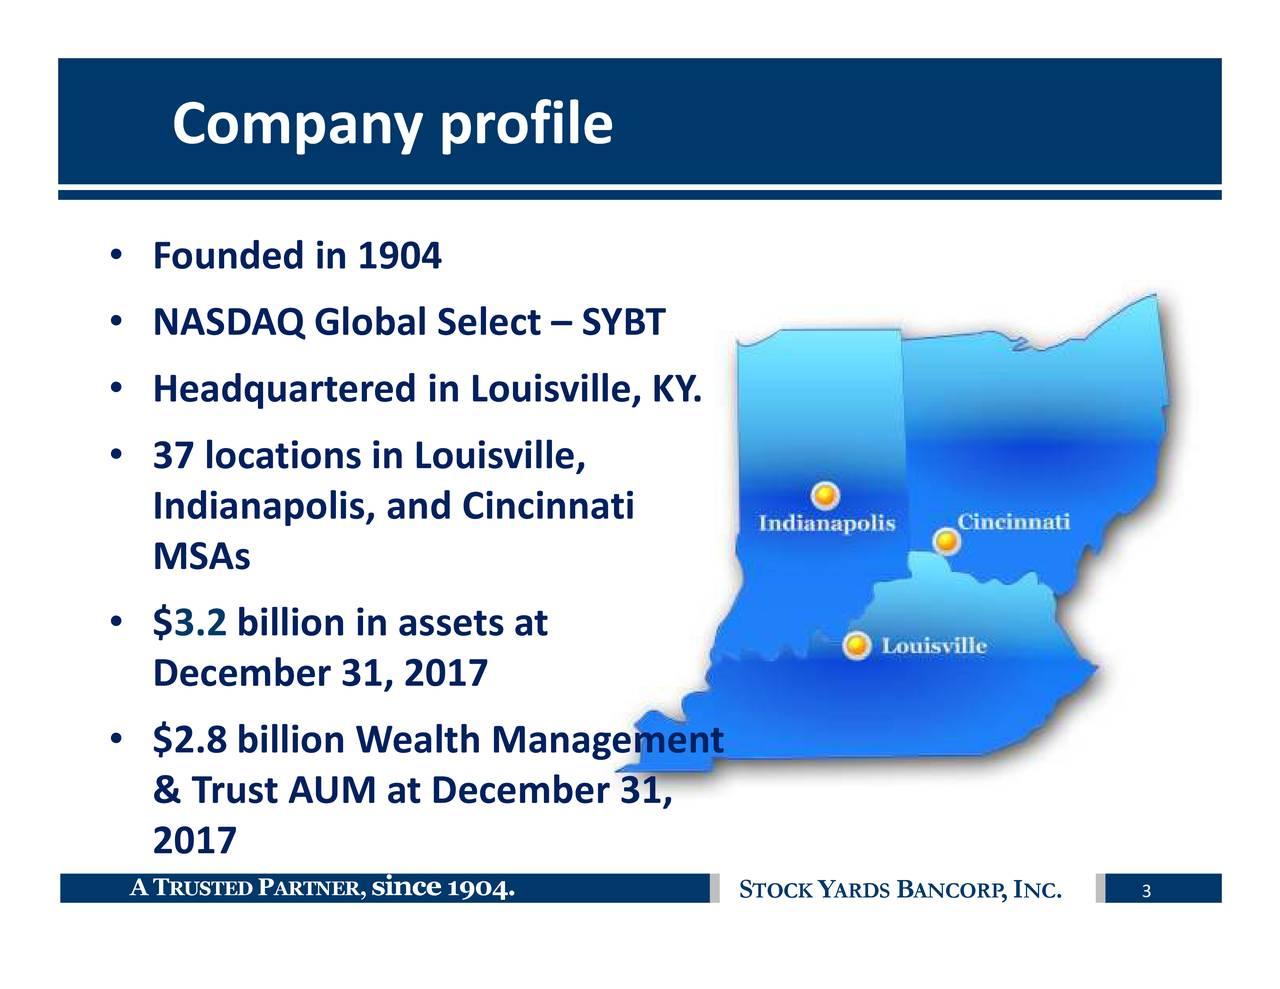 . NC ,I BNCORP YRDS SOCK 1904. ,ince ARTNER Louisville billion in assets at CompanyFouNfASD nQ1GIocttradsinLo$2iveTncK7AaUe7athDMea • • • • • • AT